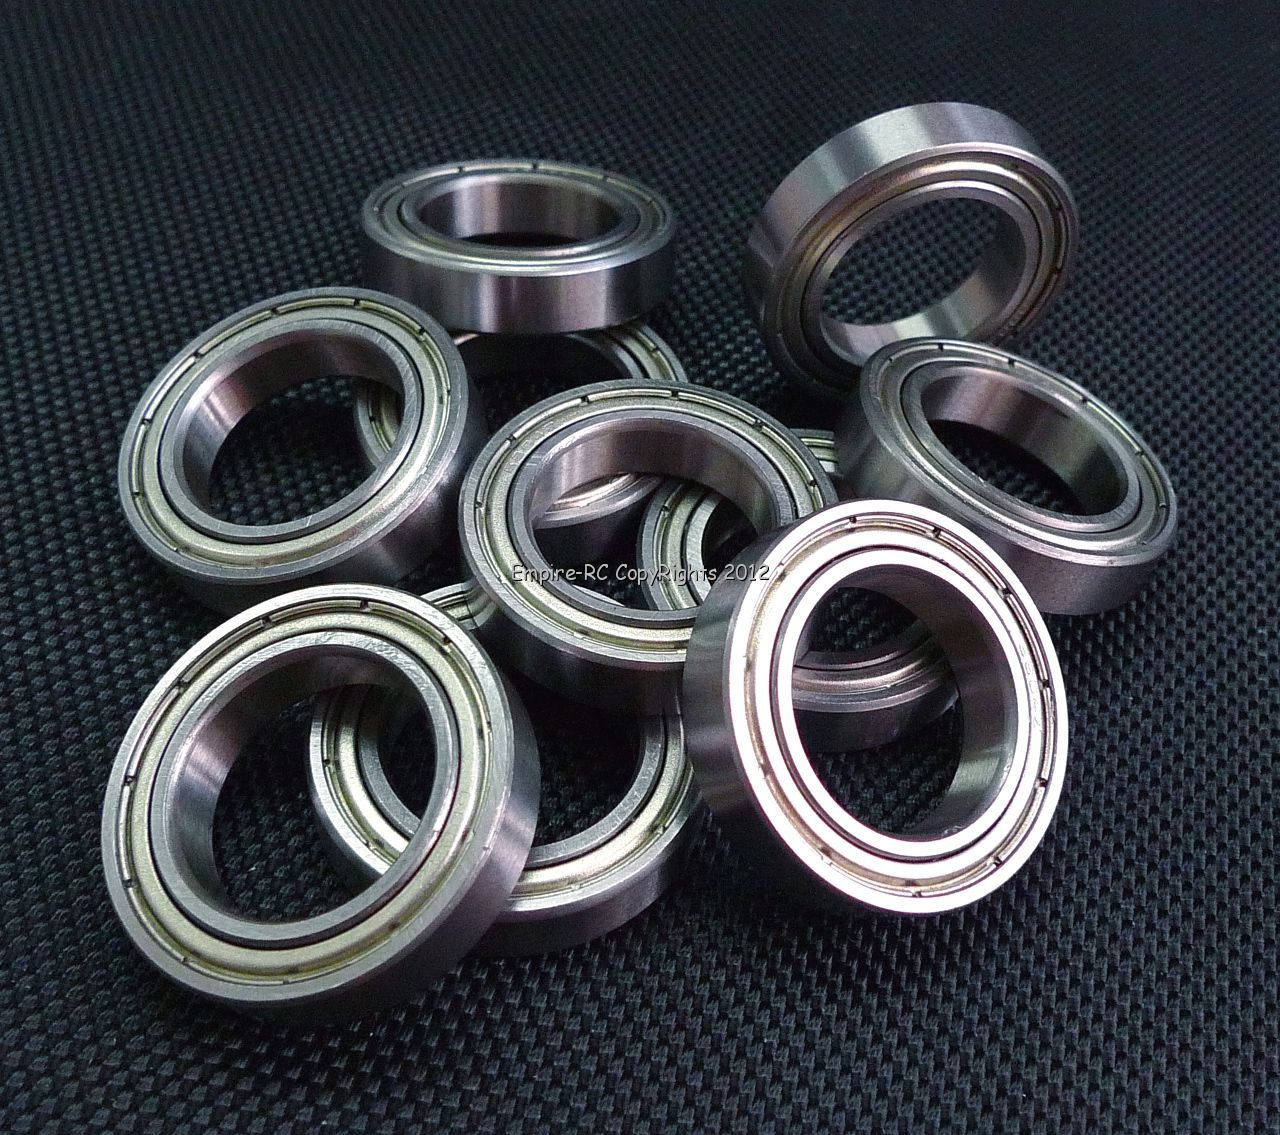 5 PCS 10x22x7 mm 62900zz Metal Shielded Ball Bearings Bearing 10*22*7 62900z